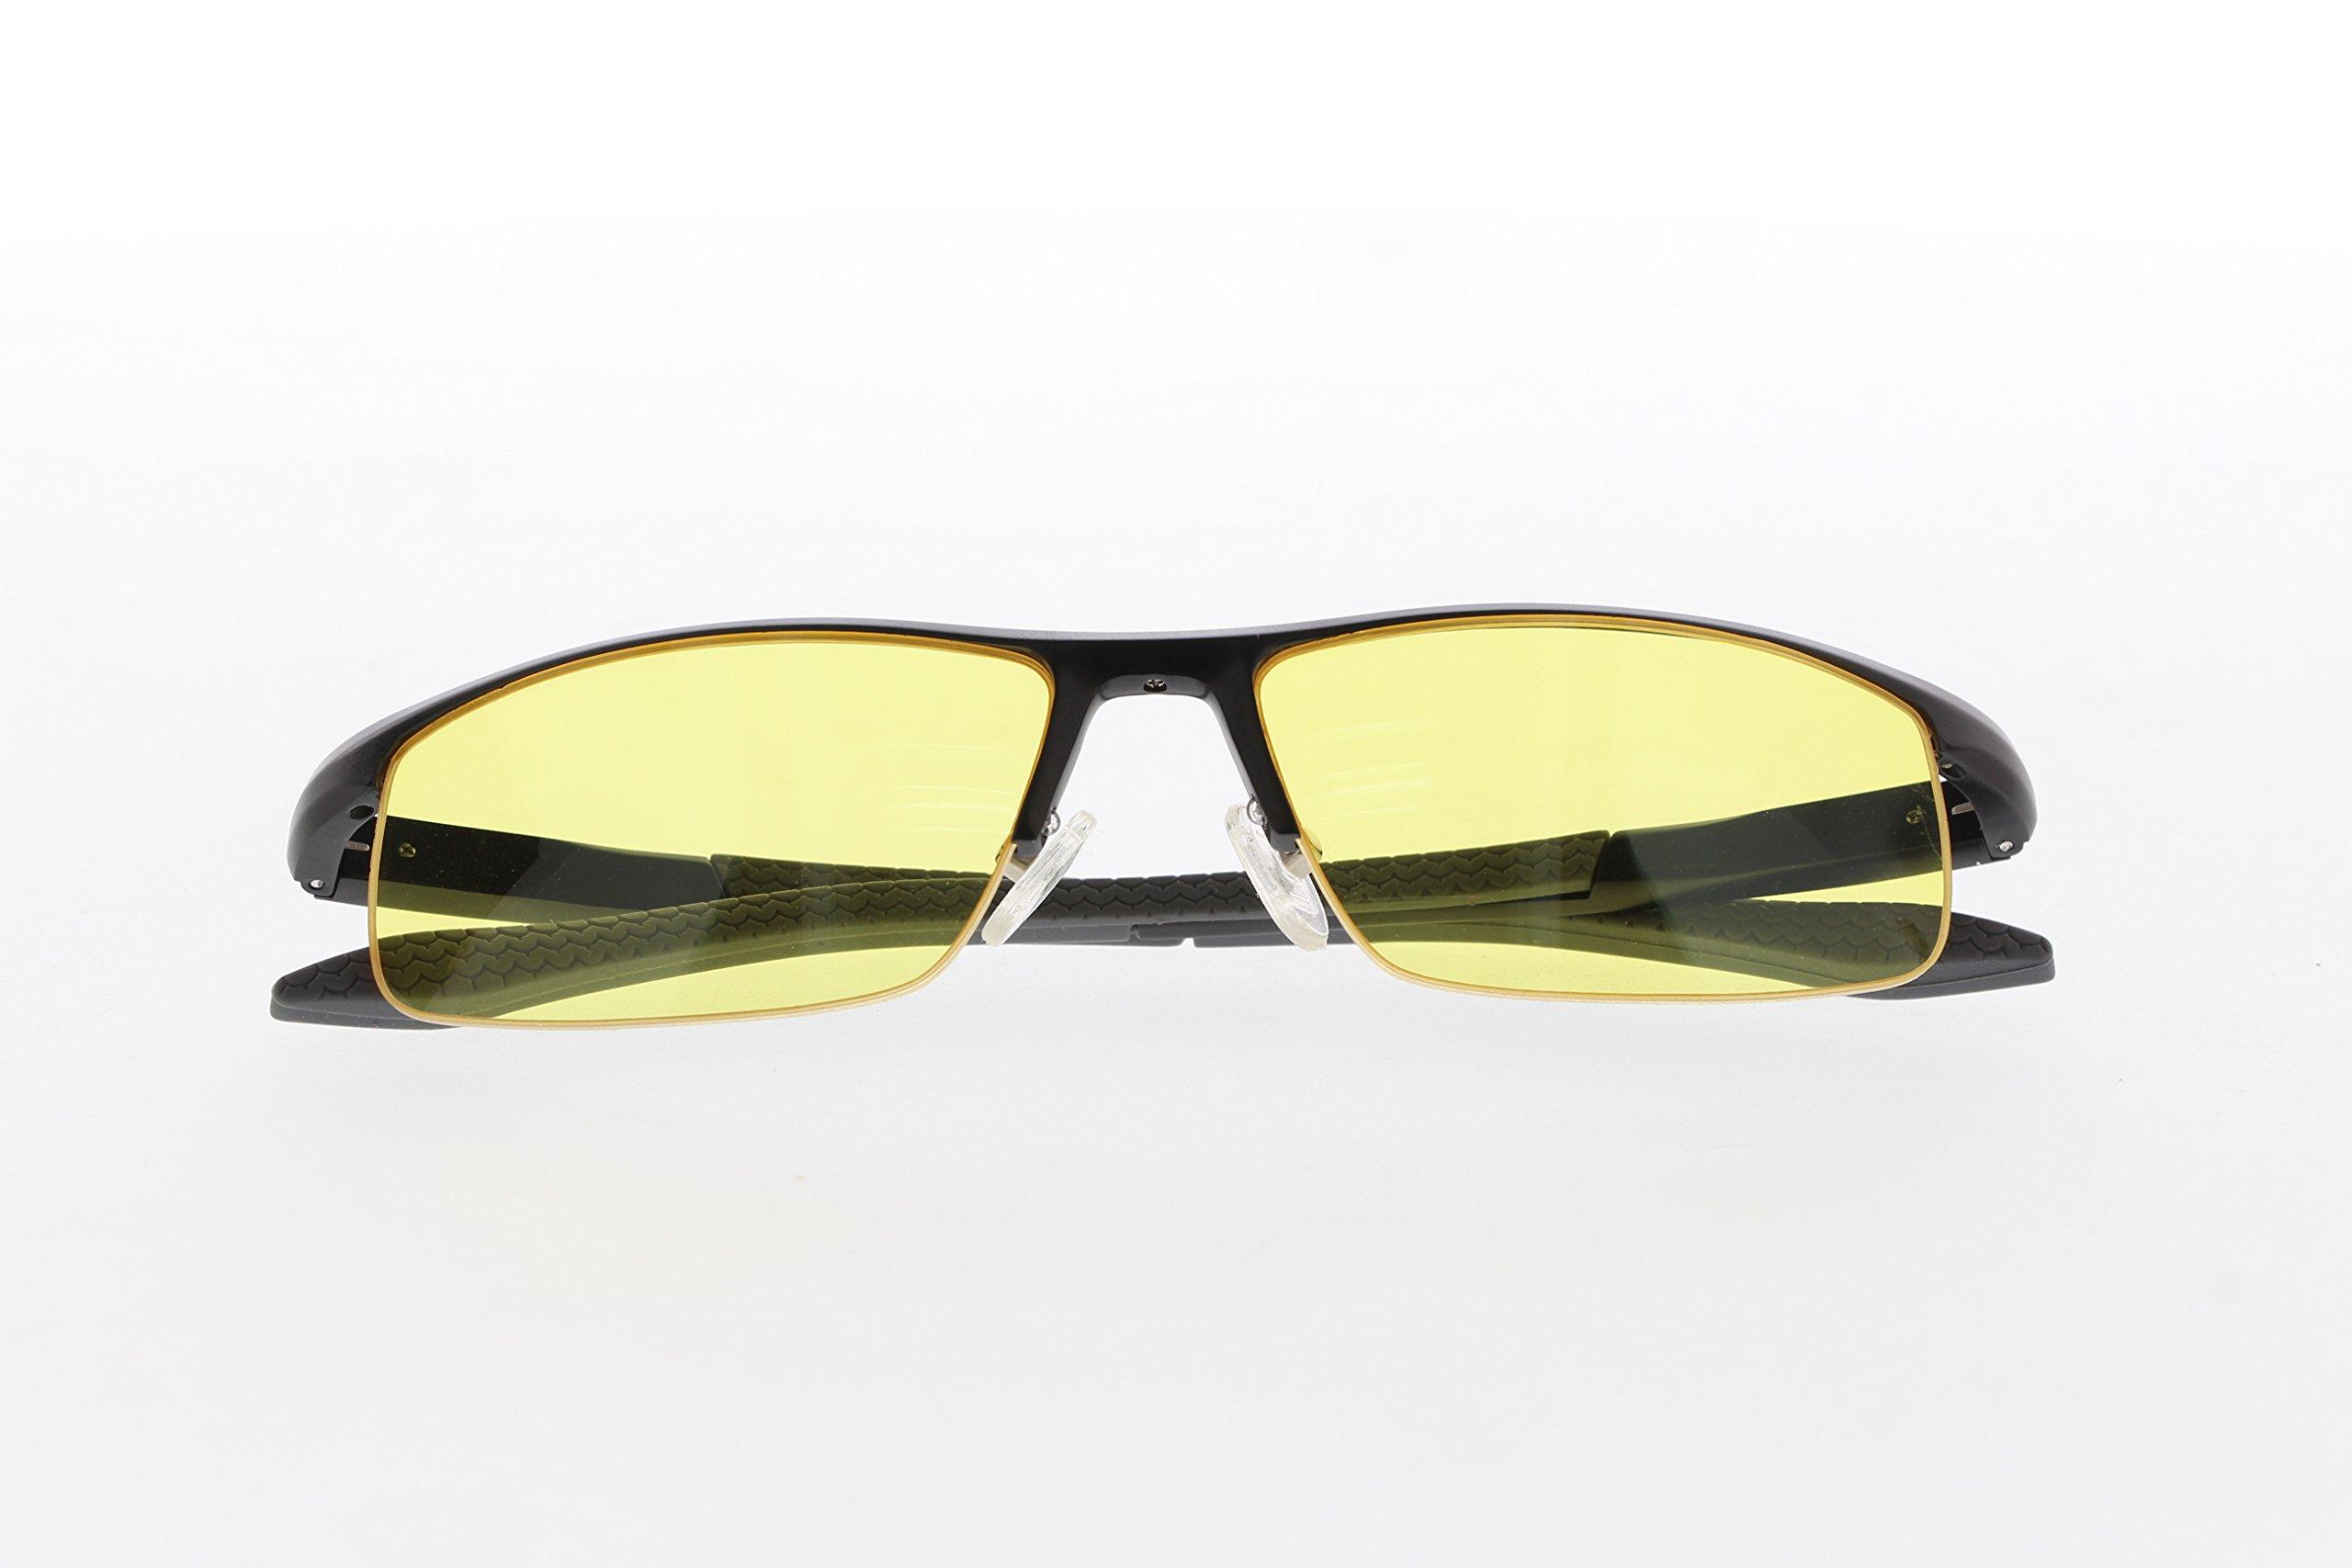 TNTi™ Billet Aluminum Frame eSport Pro Major League Gaming Glasses - Black Pearl by TNT interactive (Image #5)